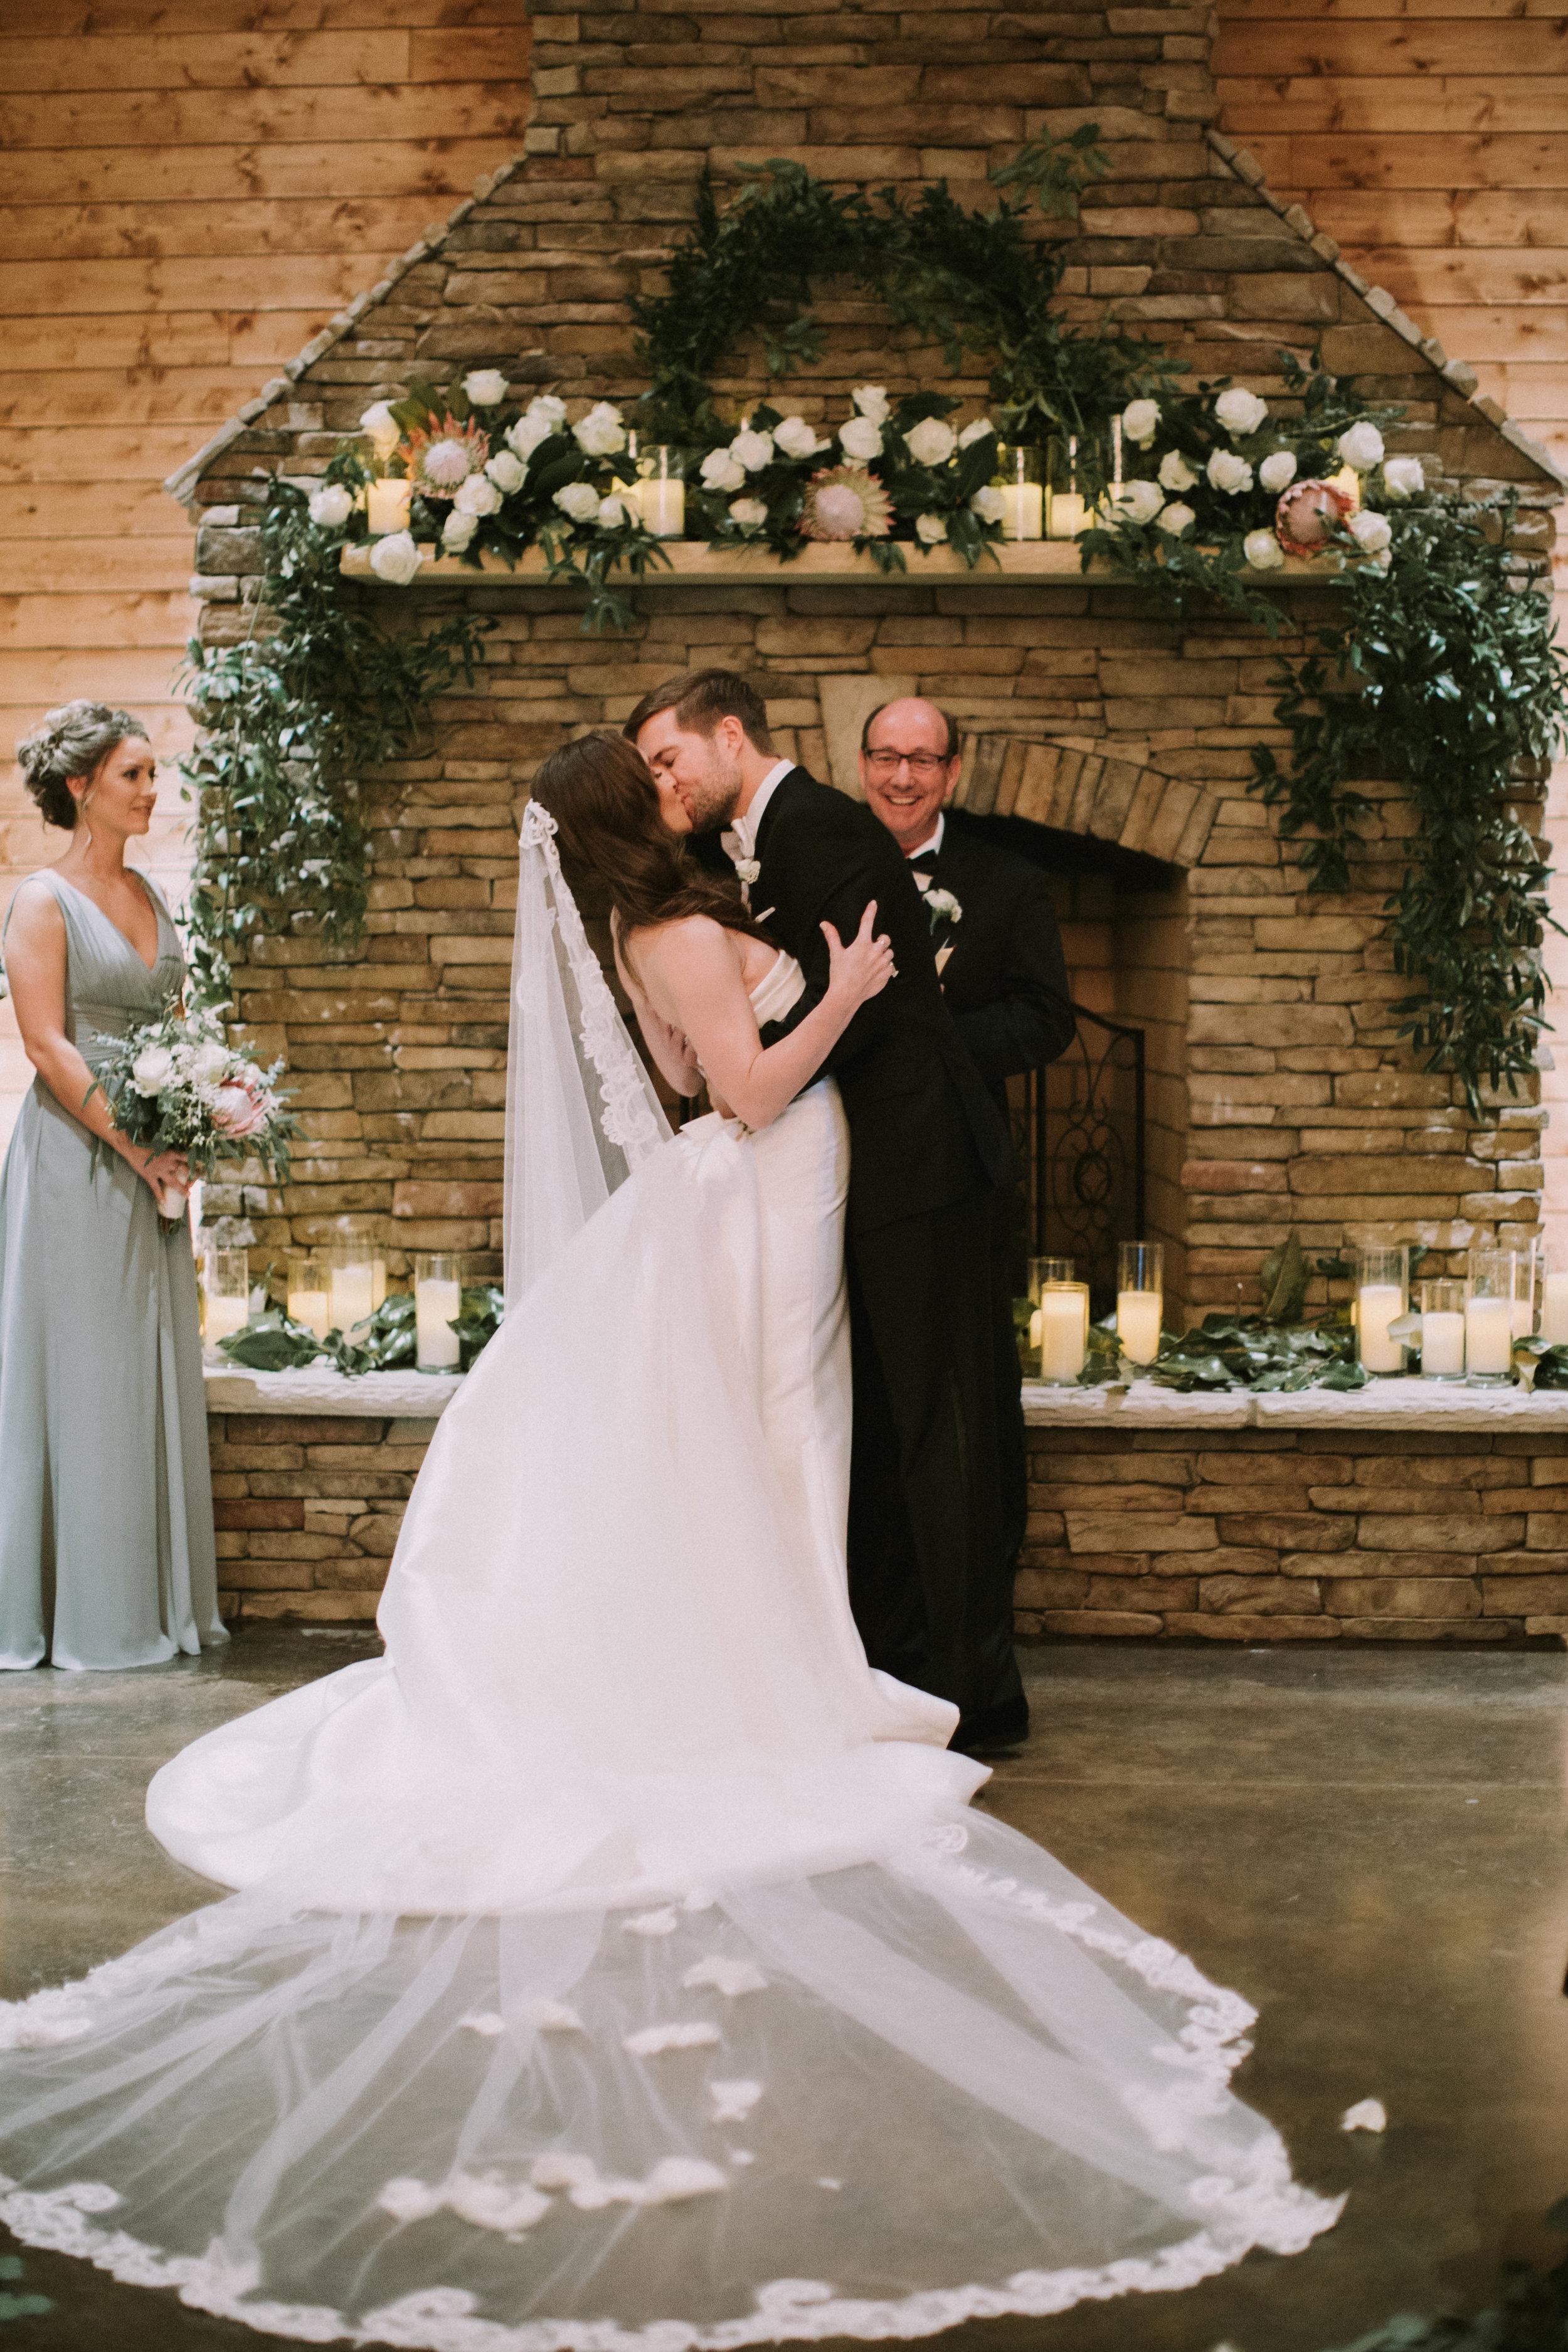 WeddingtonWedding0687.jpg